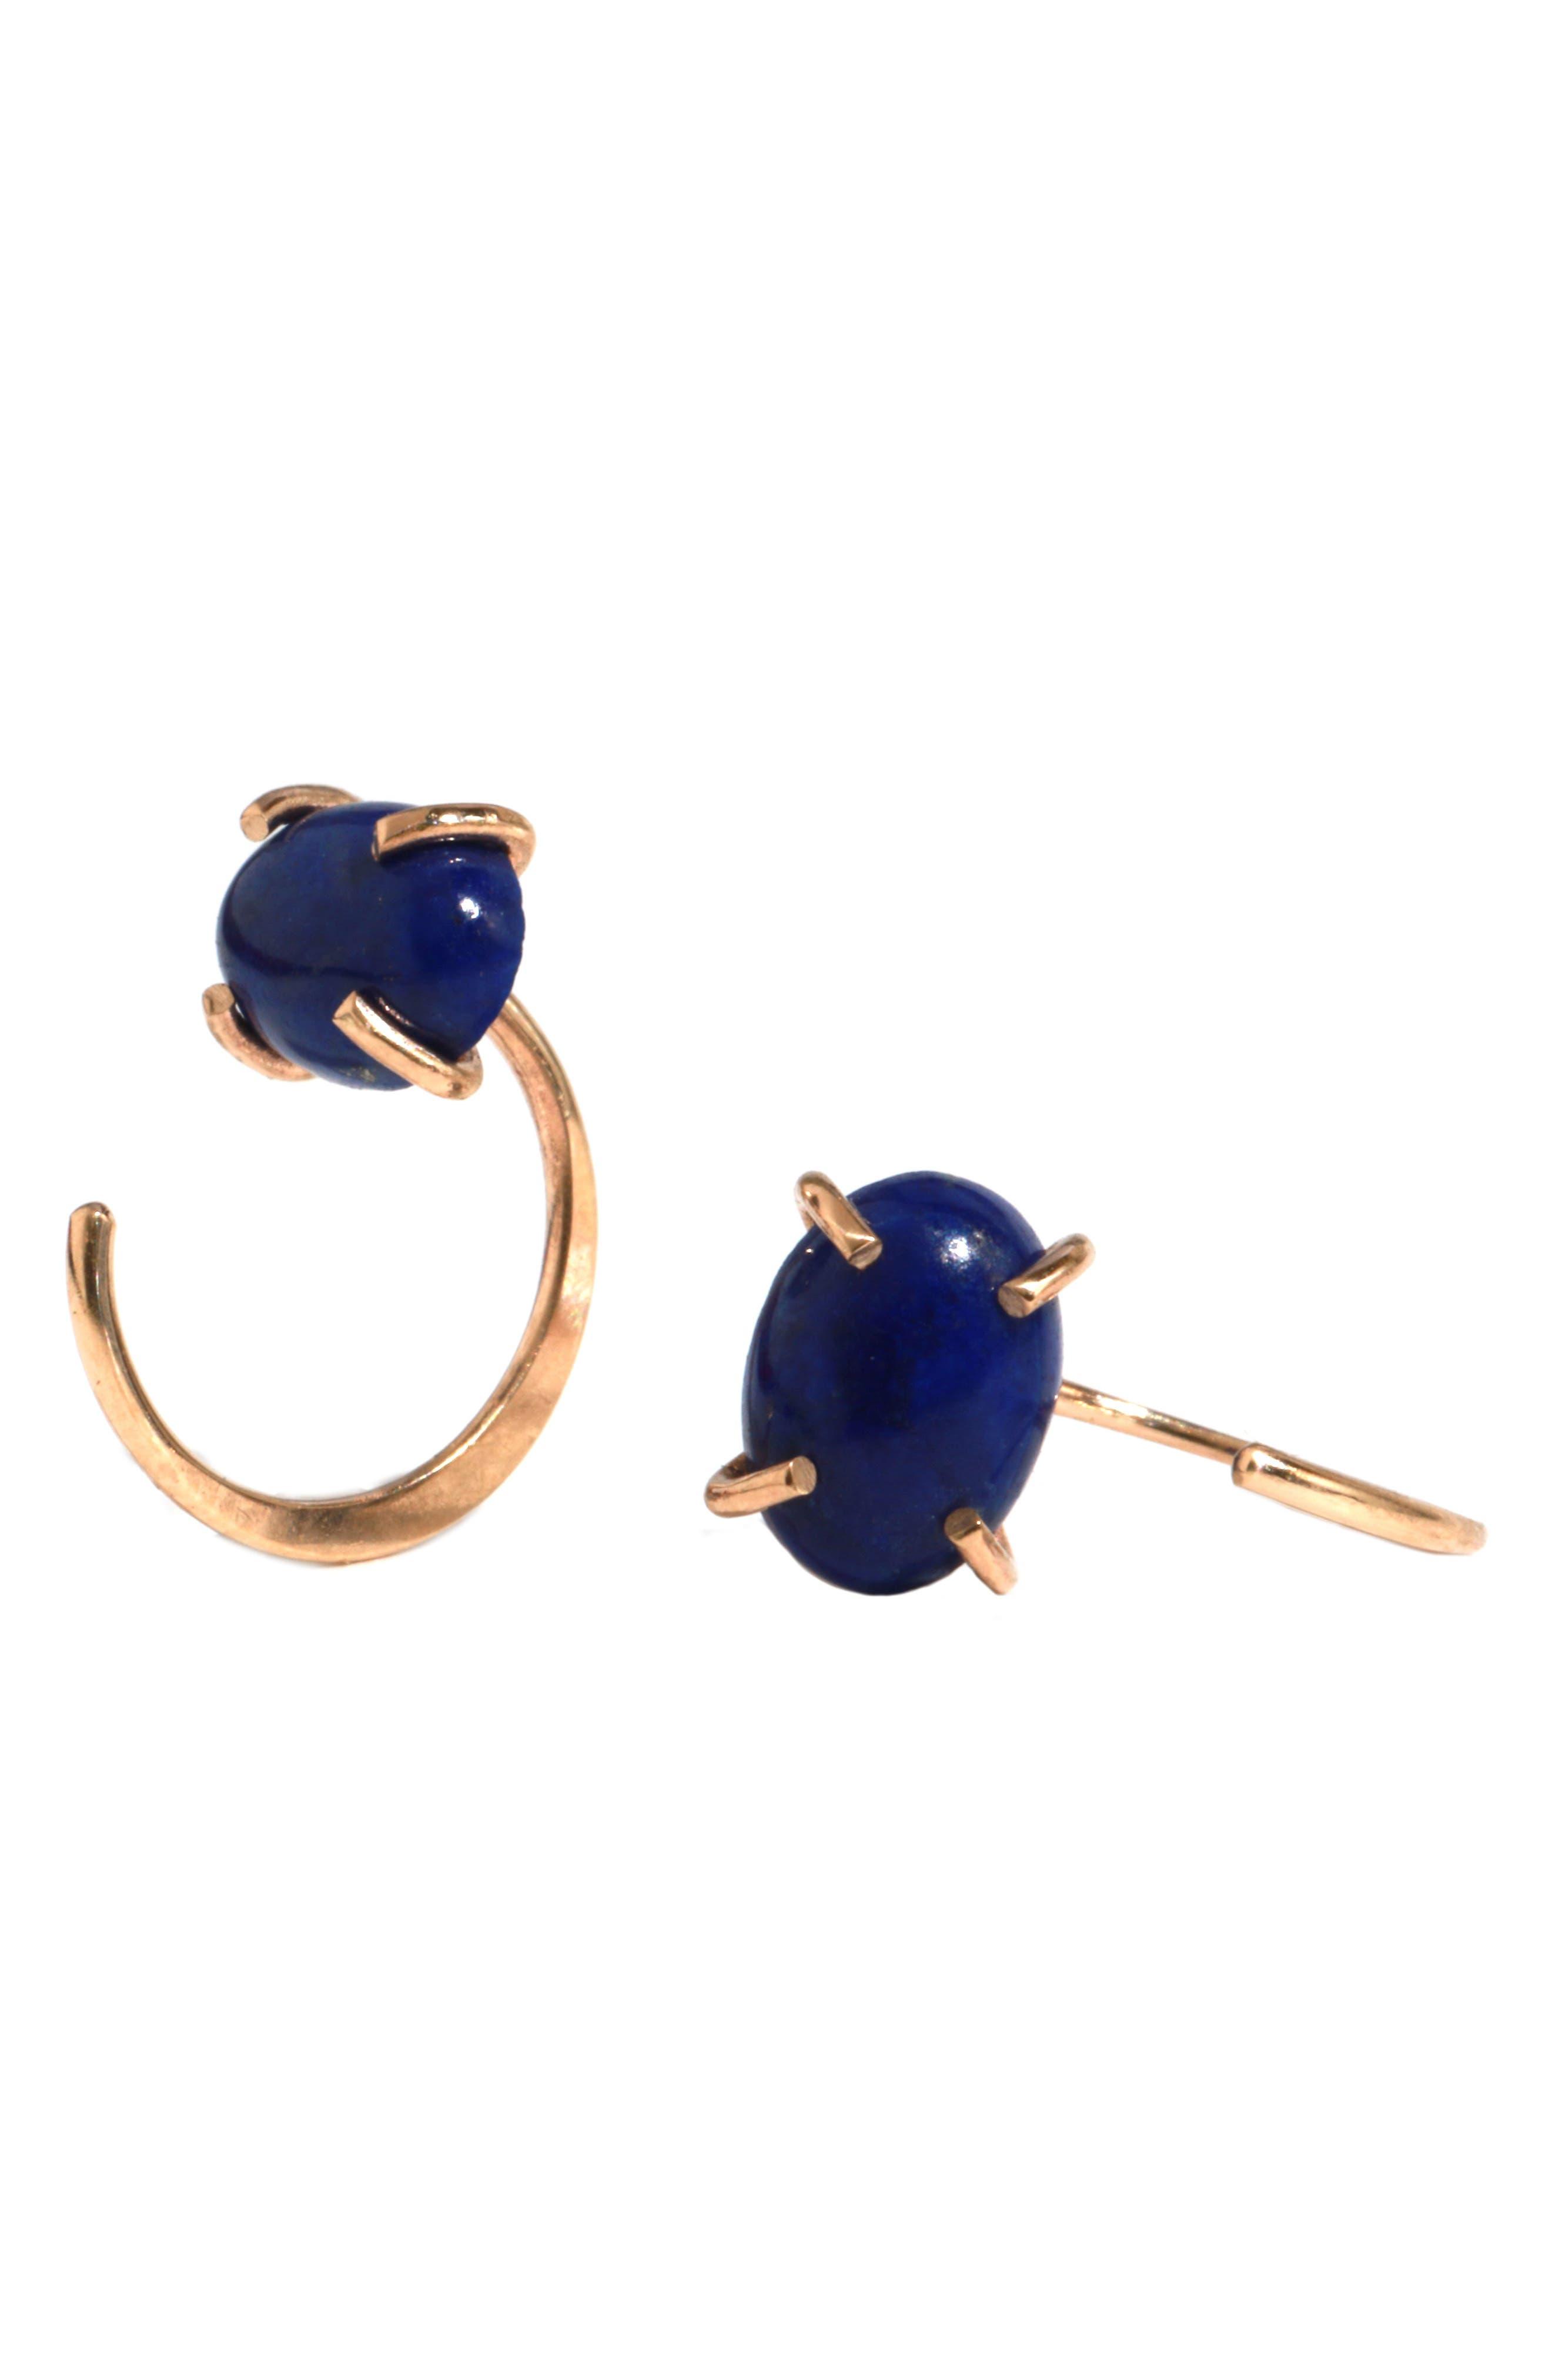 Lapis Lazuli Earrings,                             Main thumbnail 1, color,                             710